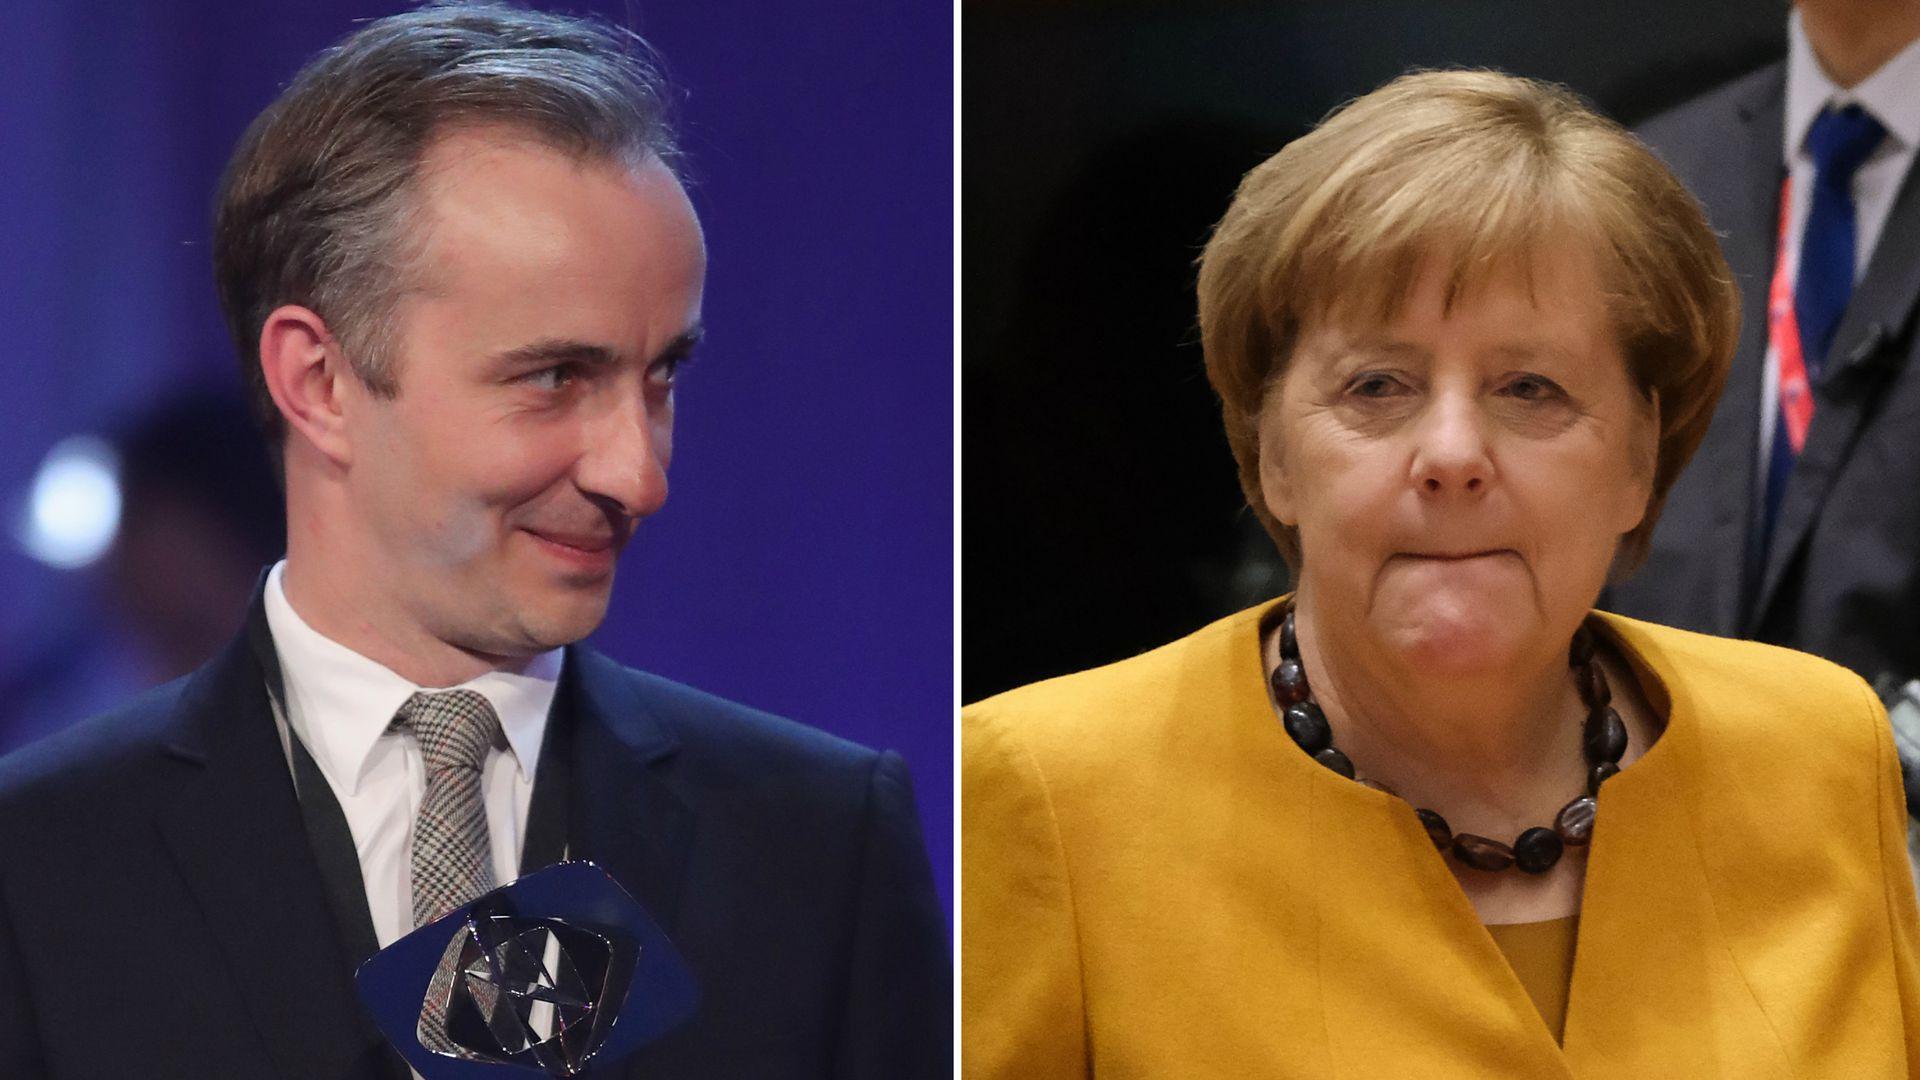 Angela Merkel Nude angela merkel, nackt. merkel nackt archive. 2019-11-02